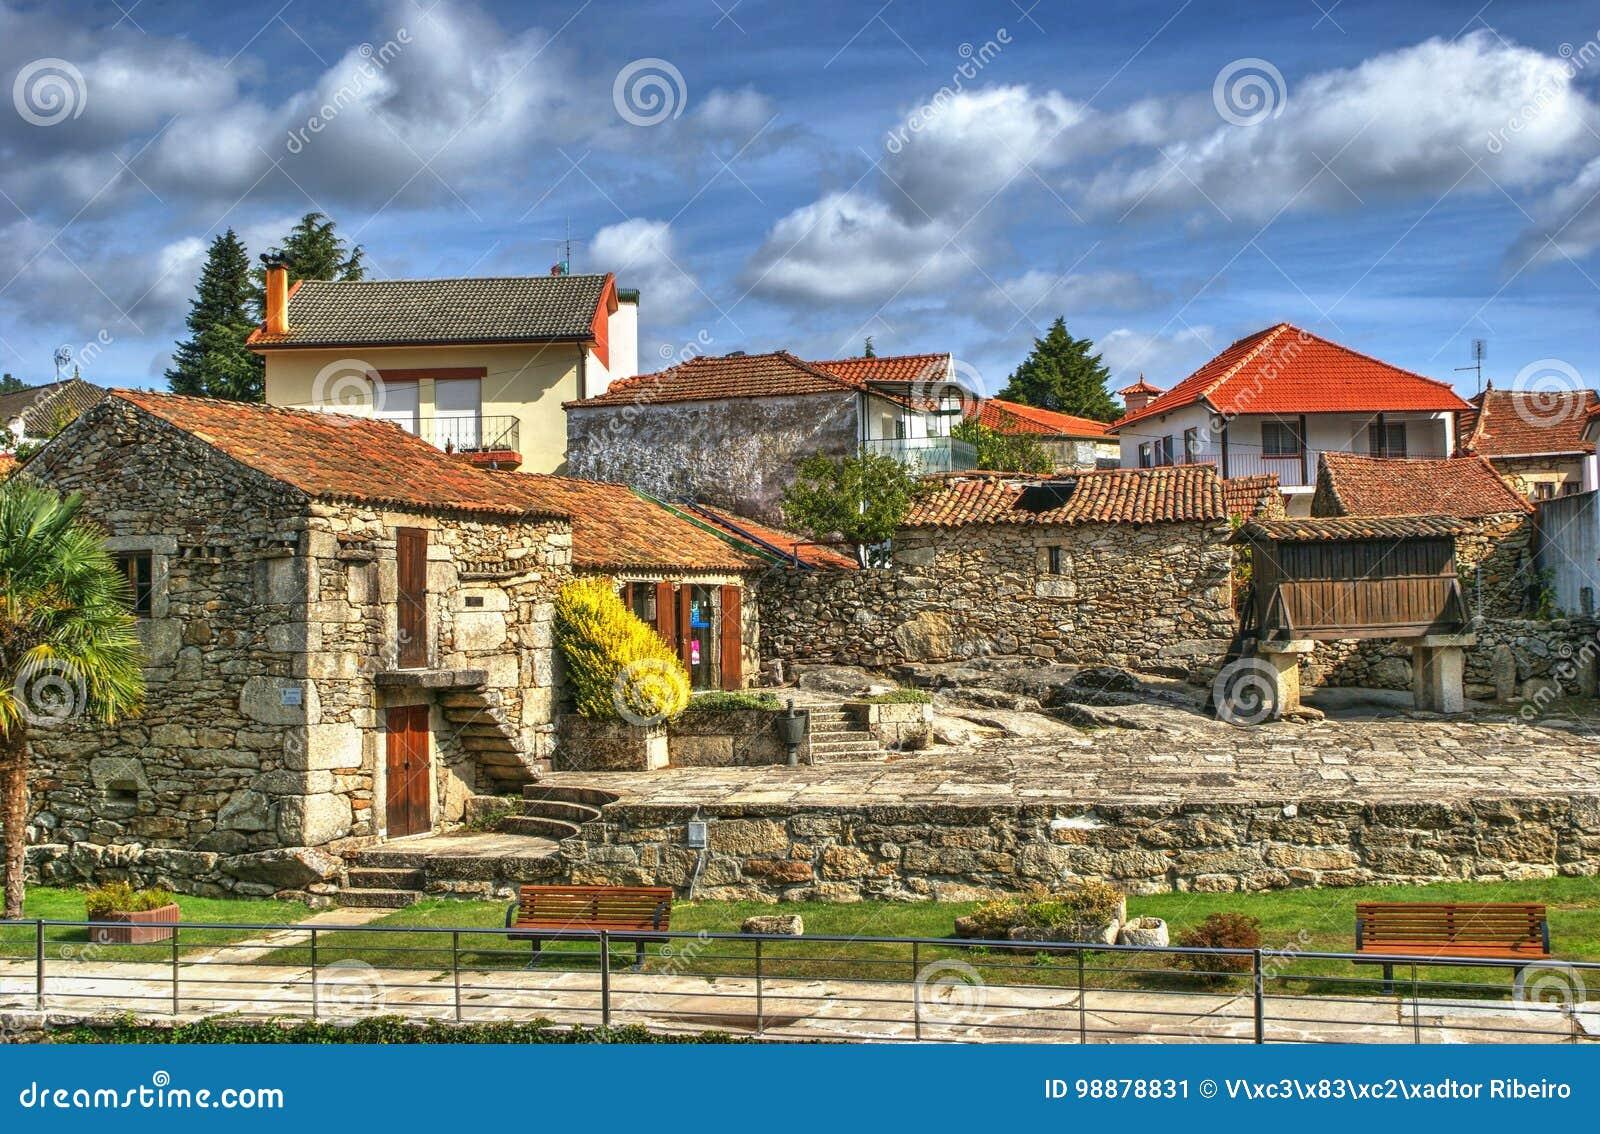 Download Small village of Boticas stock image. Image of boticas - 98878831